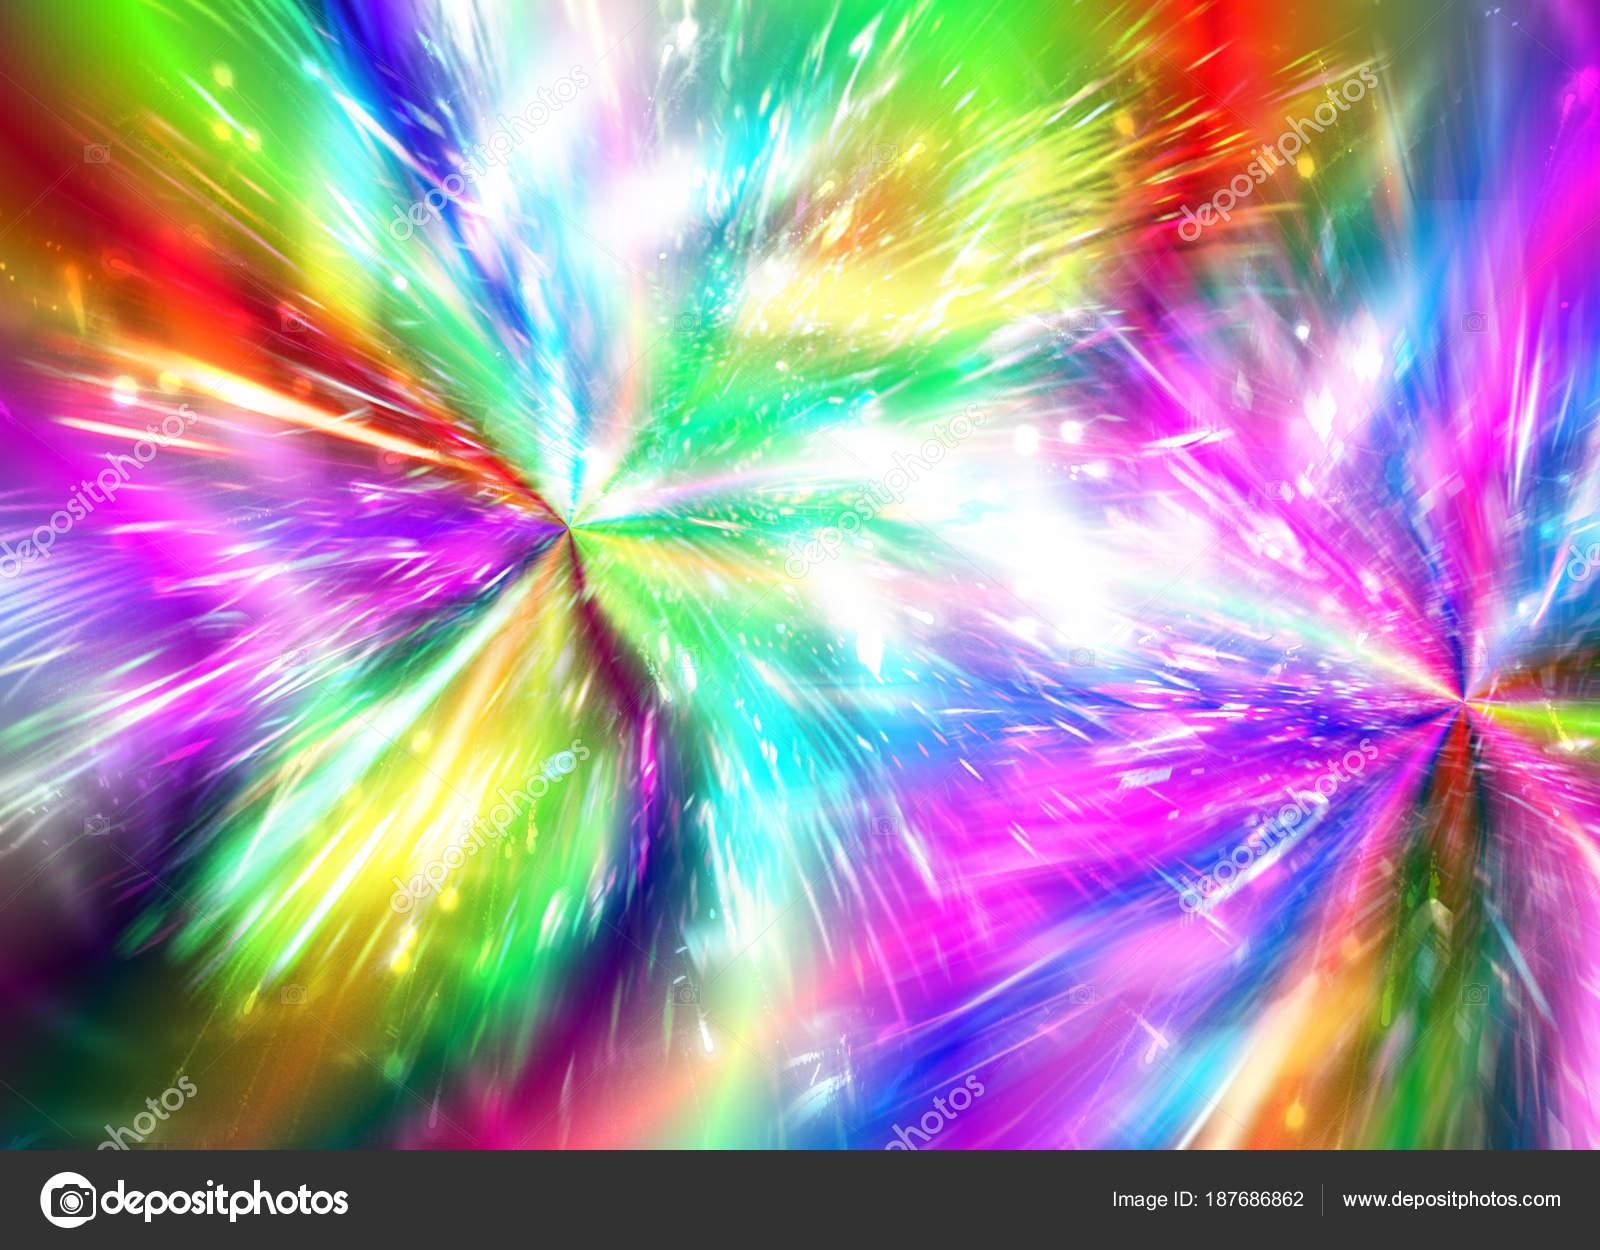 Rainbow Fireworks Celebration Colorful Abstract Image With: Arco-íris Resumo Fundo Fogos De Artifício, Fogos De